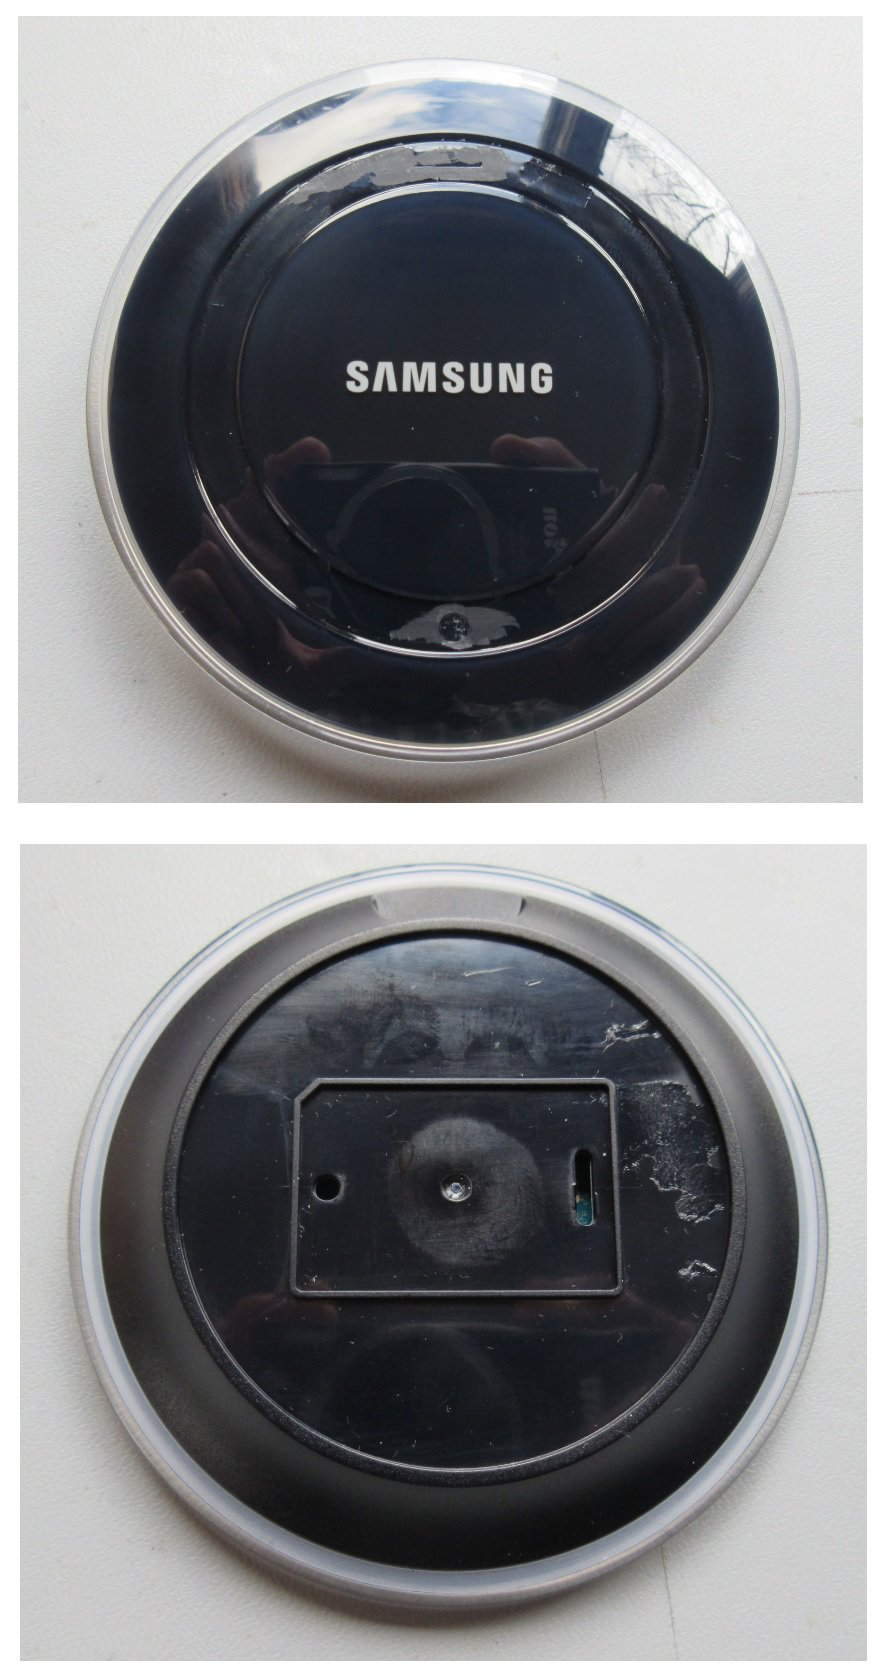 Samsung Wireless Charger Teardown (EP-PG9201) 12